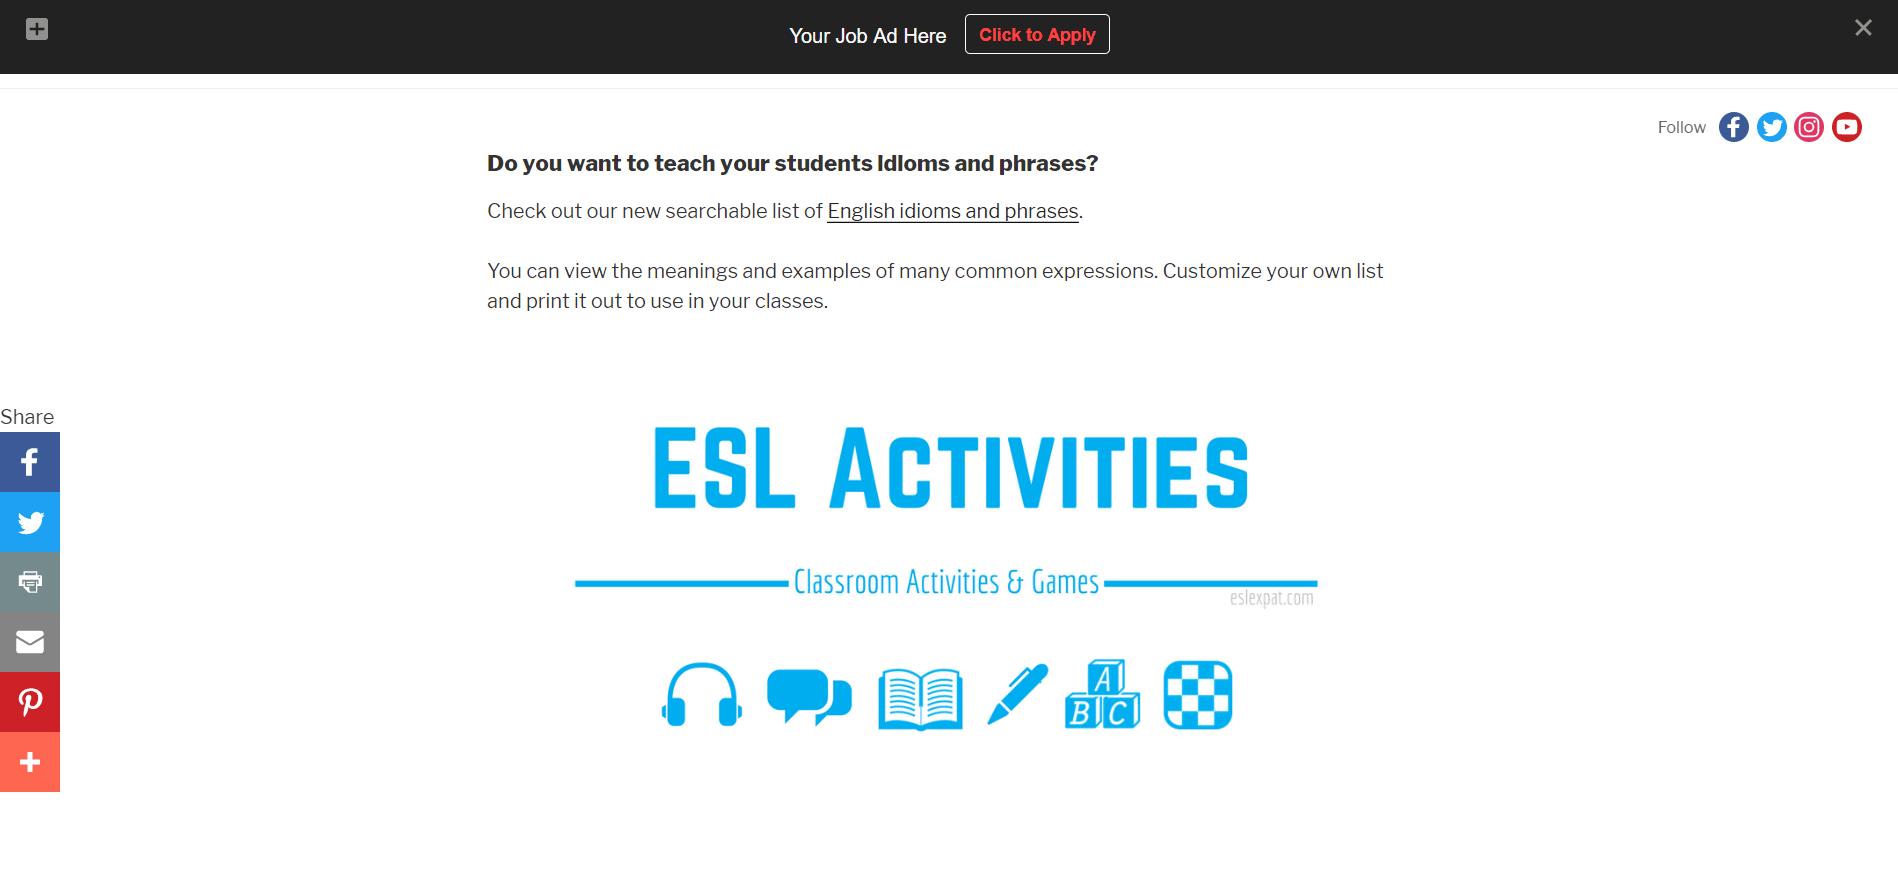 Post a Job ▻ Find an English Teacher - Job Post Options - ESL Expat